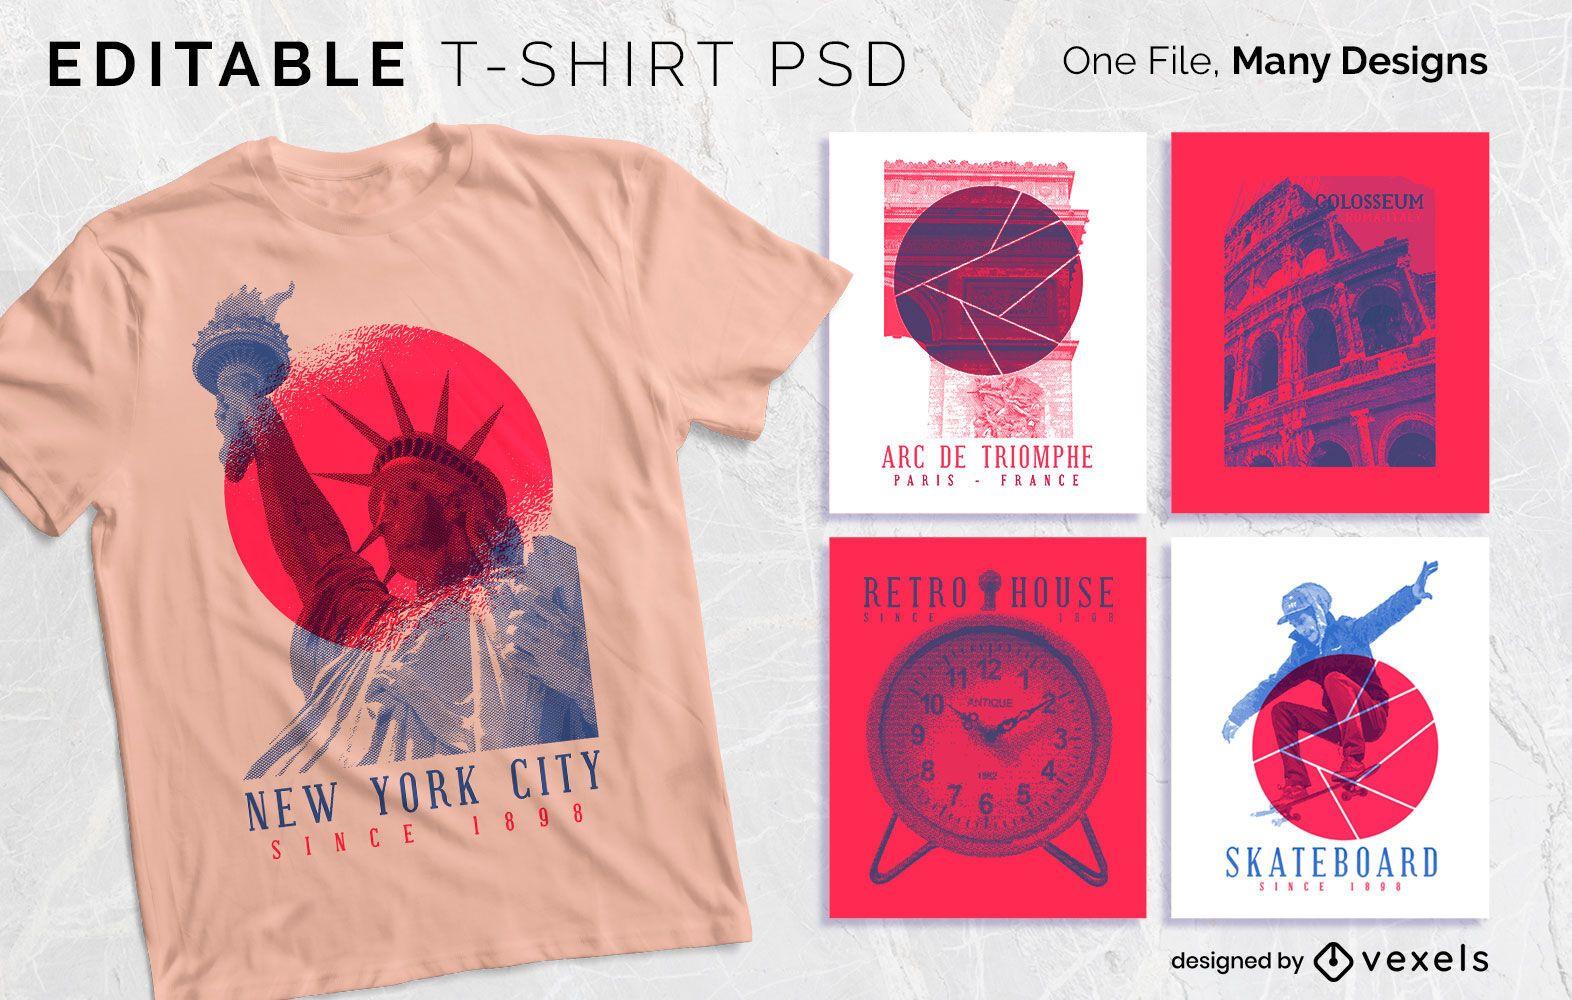 Duotone Serigraphy T-shirt Design PSDD